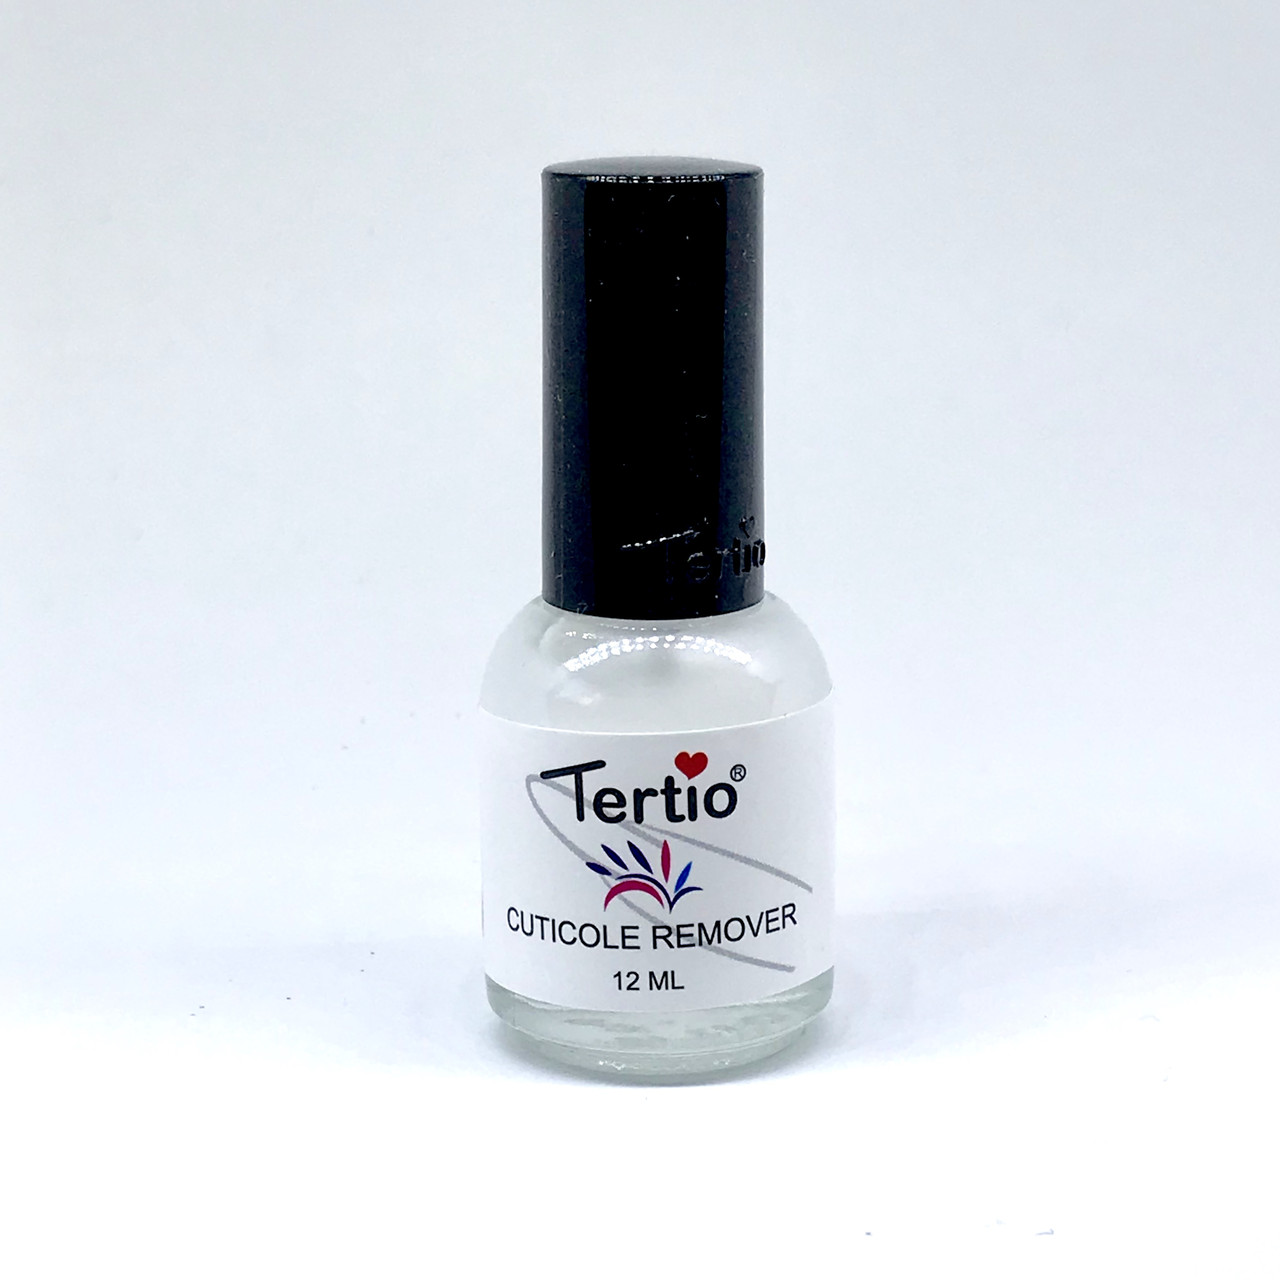 Ремувер для кутикулы Tertio 12 мл